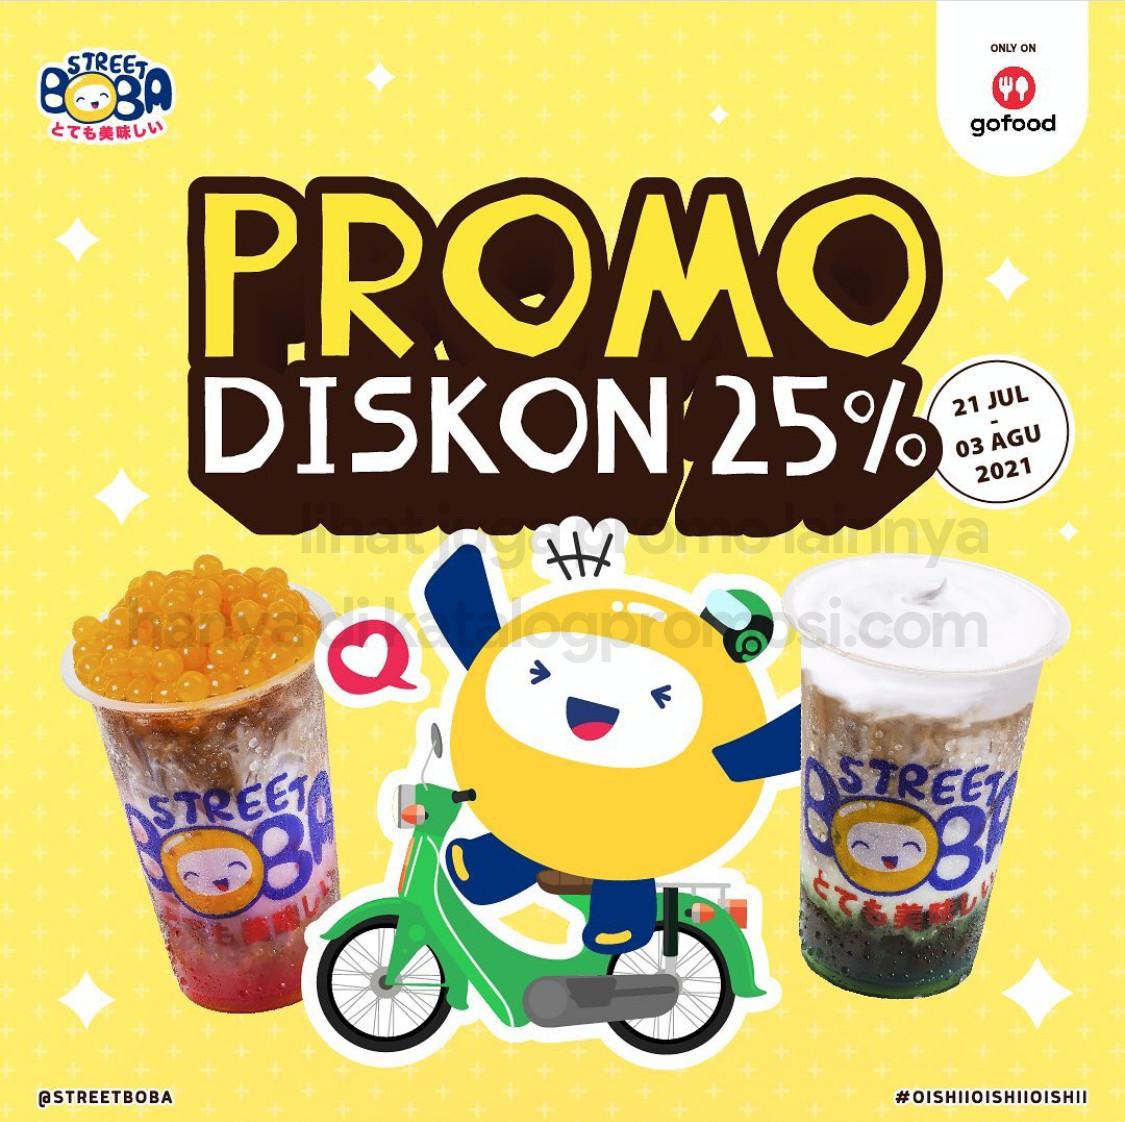 STREET BOBA Promo DISKON 25% untuk Pembelian Paket Minuman Pilihan via GOFOOD